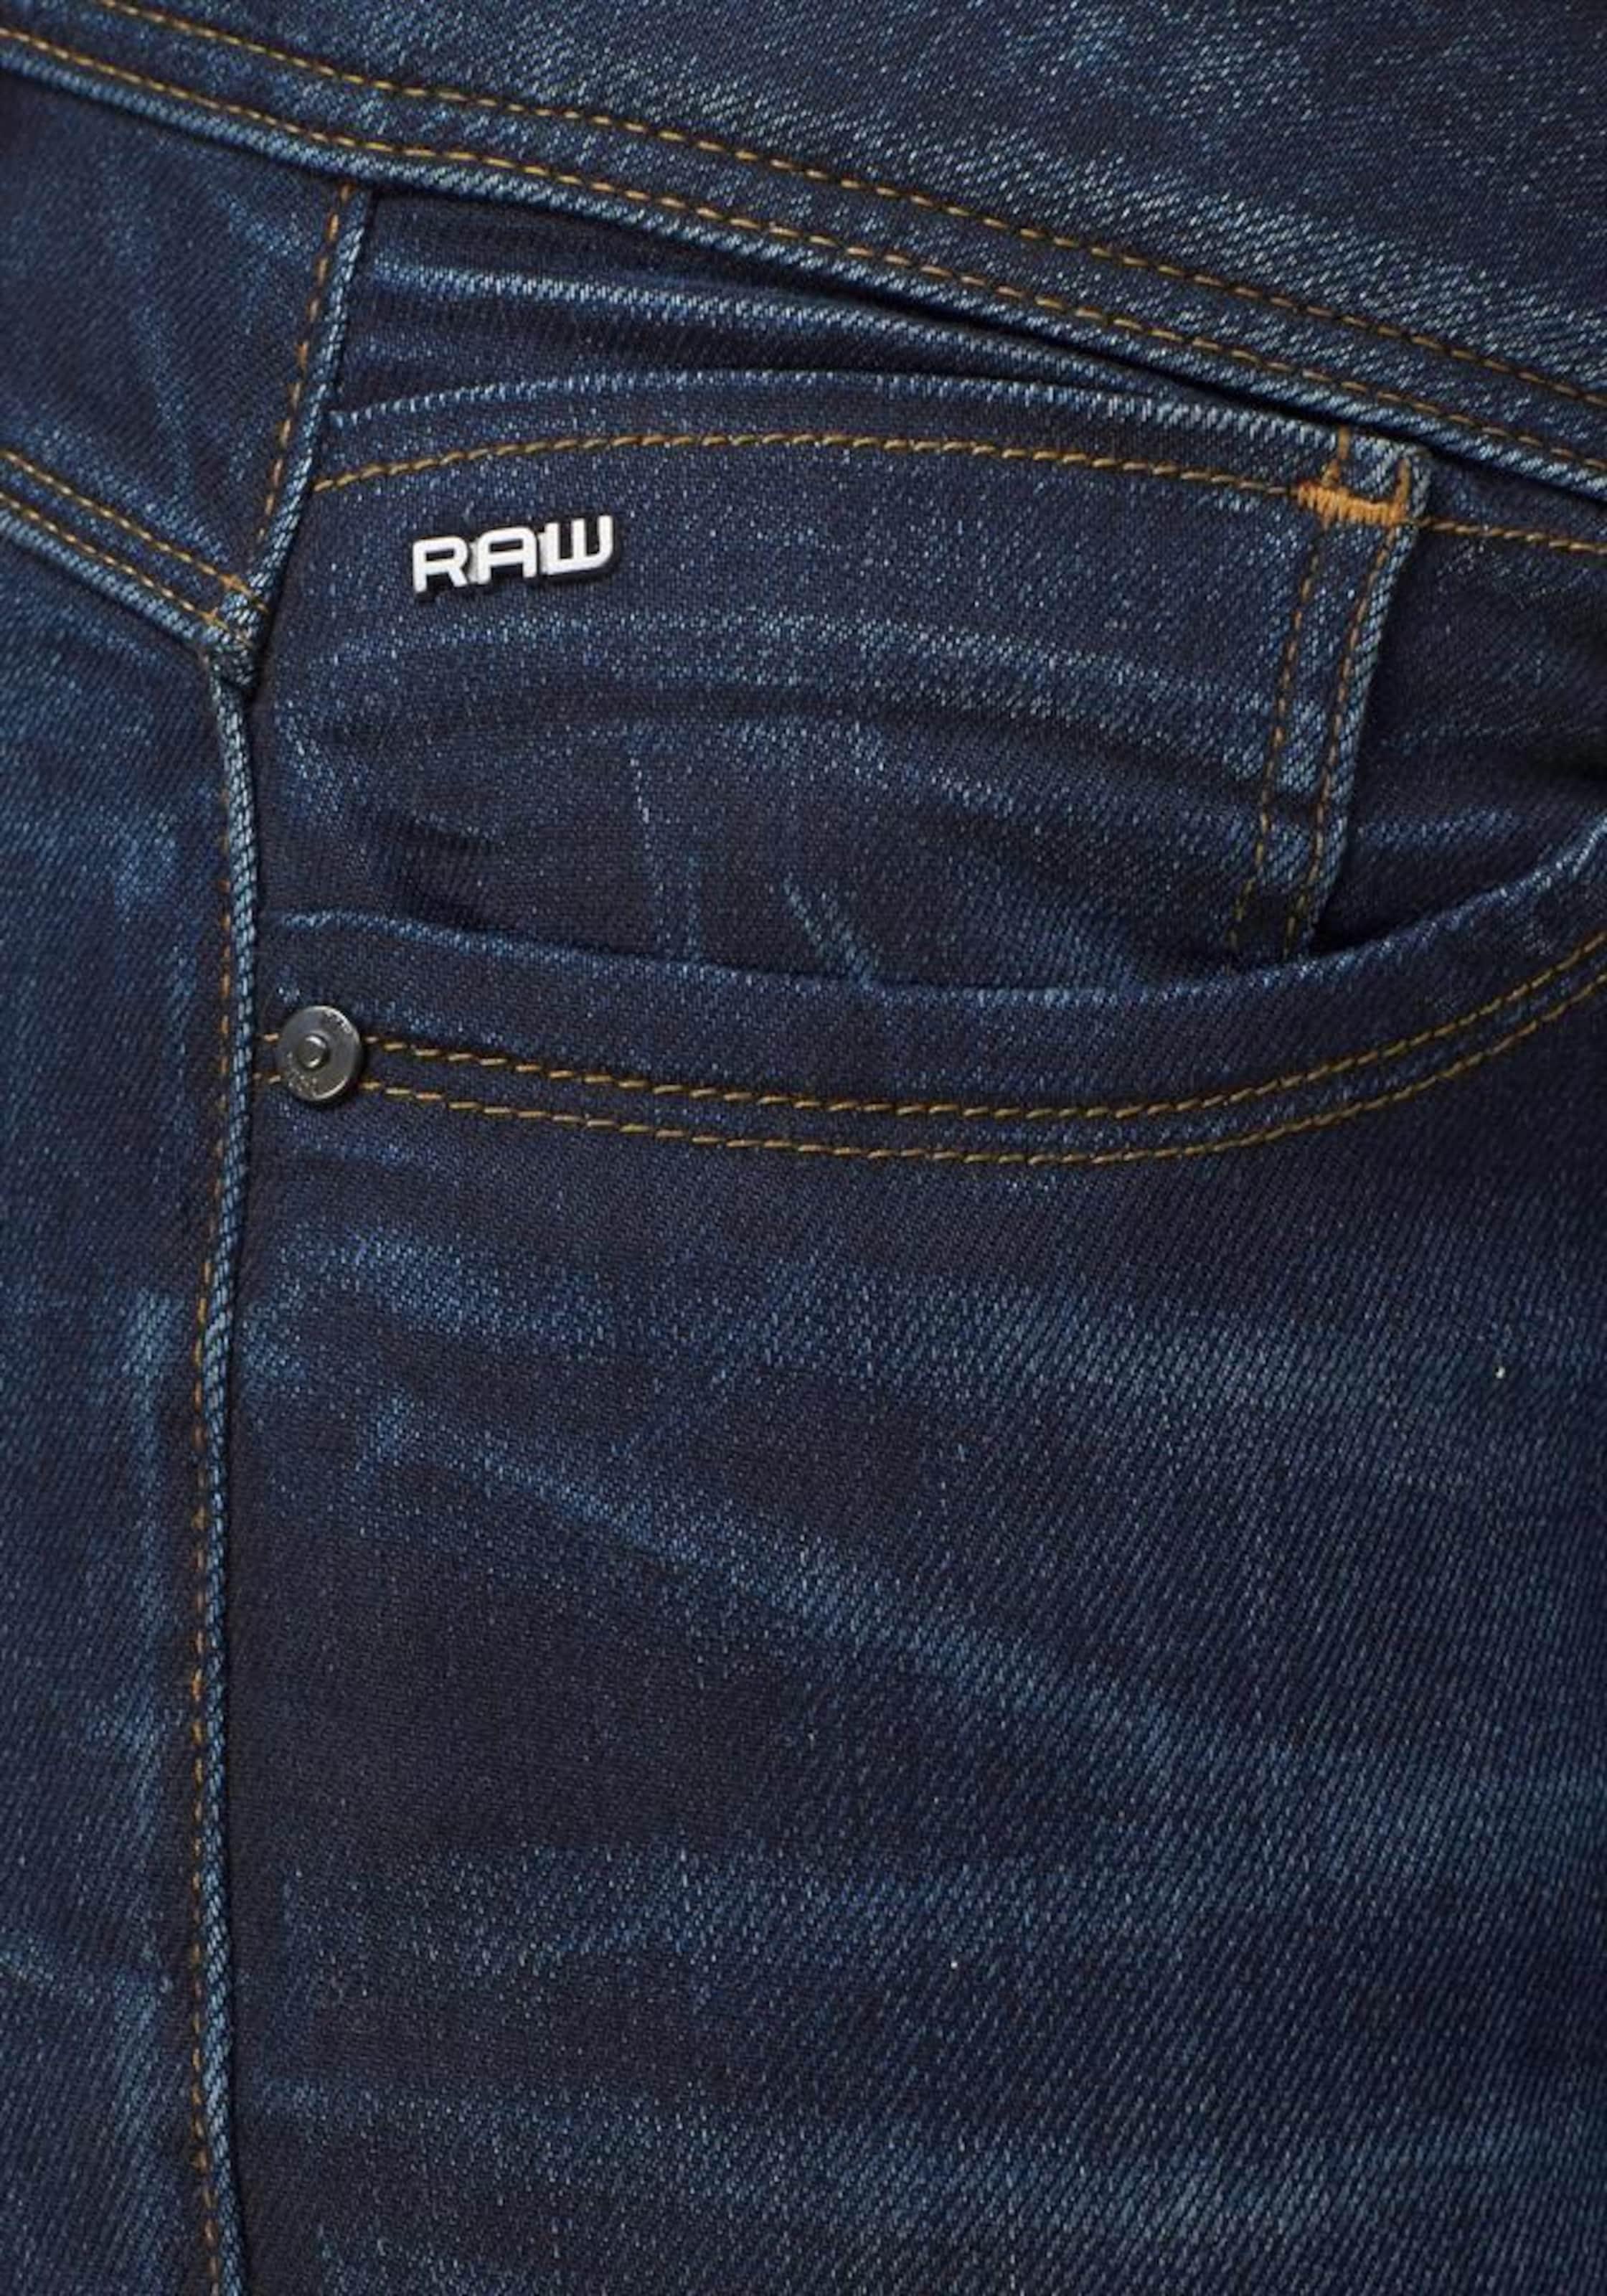 Raw G 'lynn' Jeans Nachtblauw star In FK1Jcl